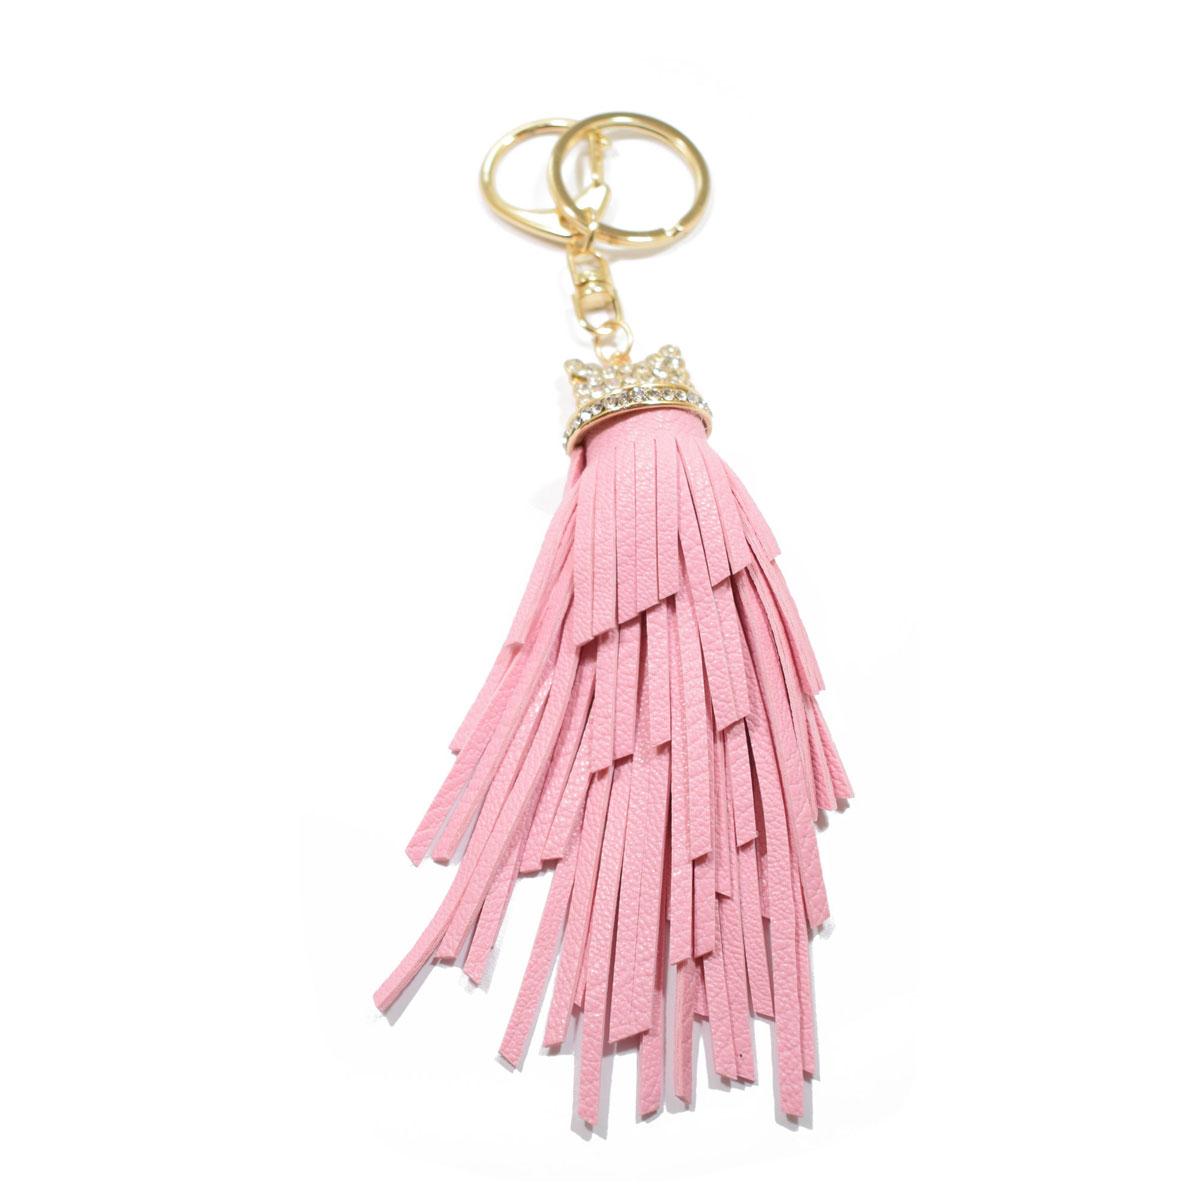 143004f25d Μπρελόκ φο μπιζού (faux bijoux) φούντα σε ροζ χρώμα με κρυστάλλους  (BZ-KC-00001)